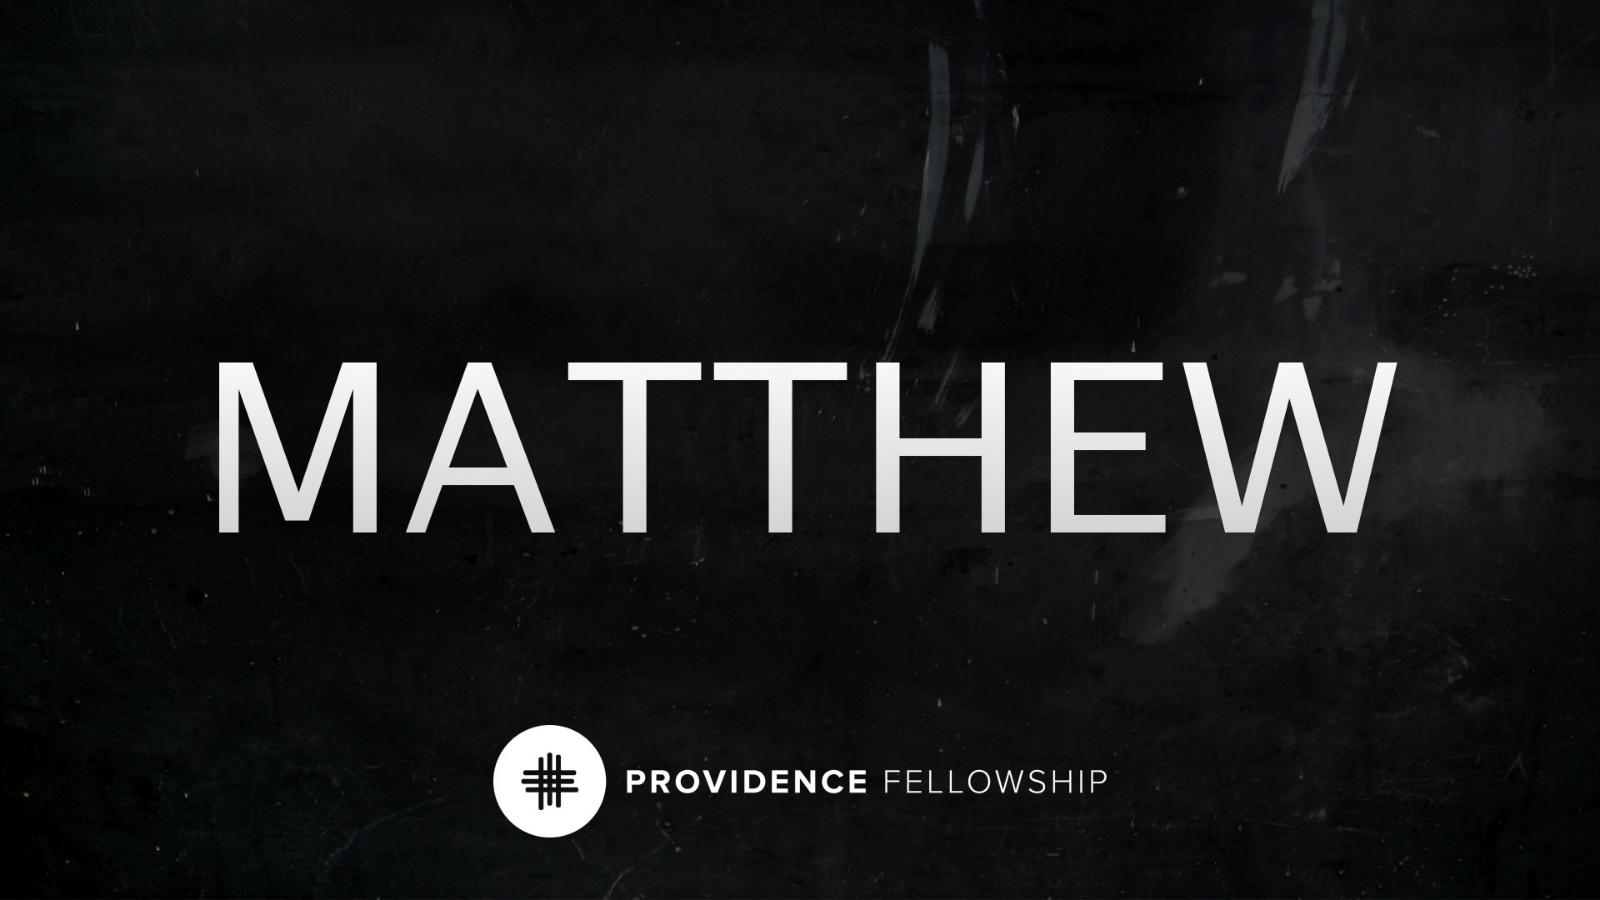 The life of Christ - Matthew 1:1Chad Cronin